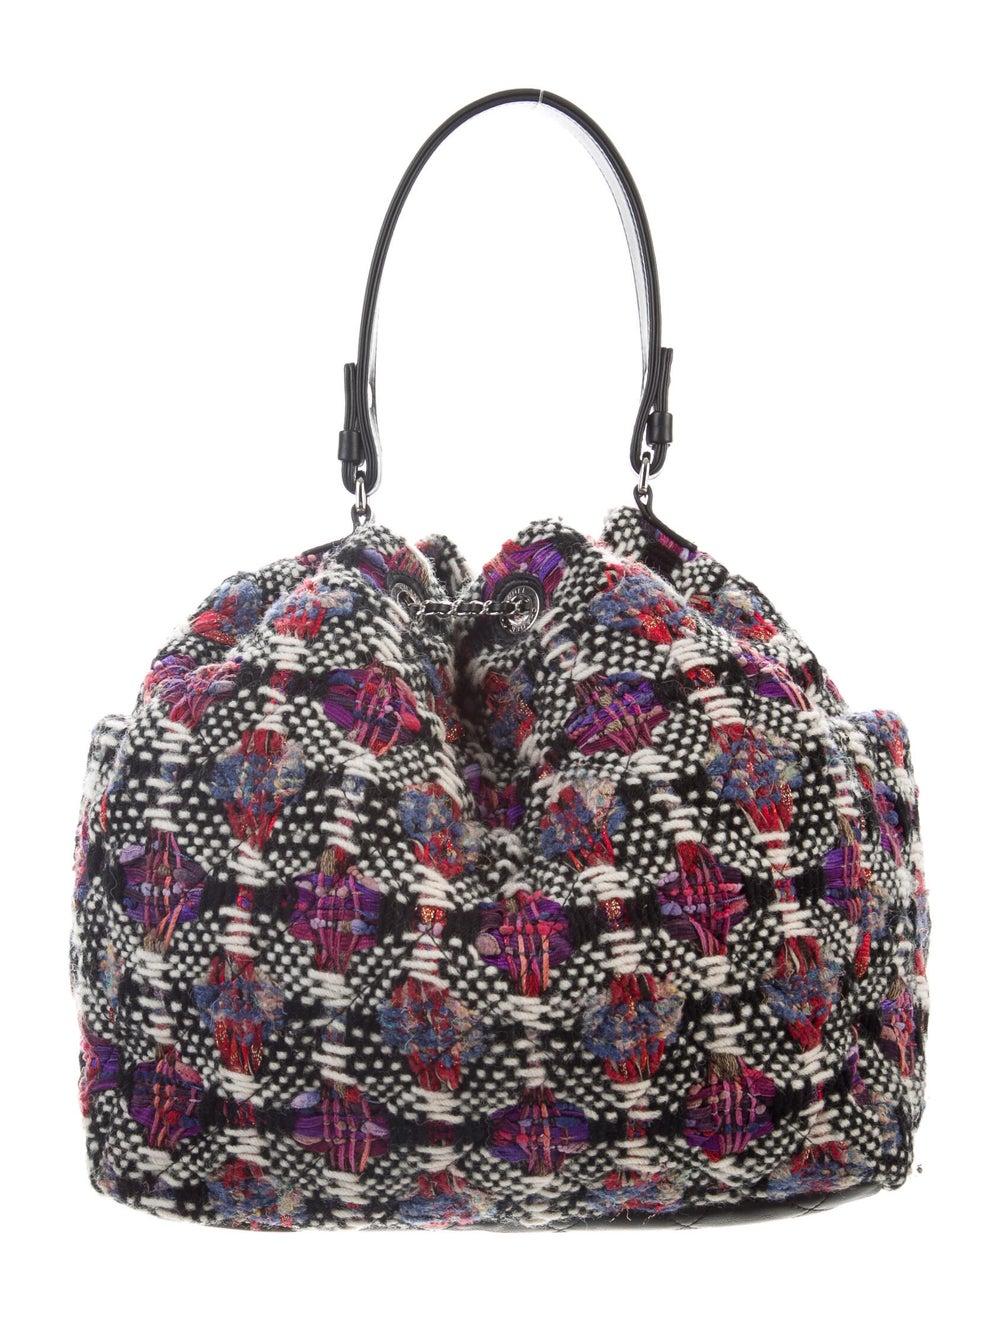 Chanel Tweed Drawstring Bag Cream - image 4